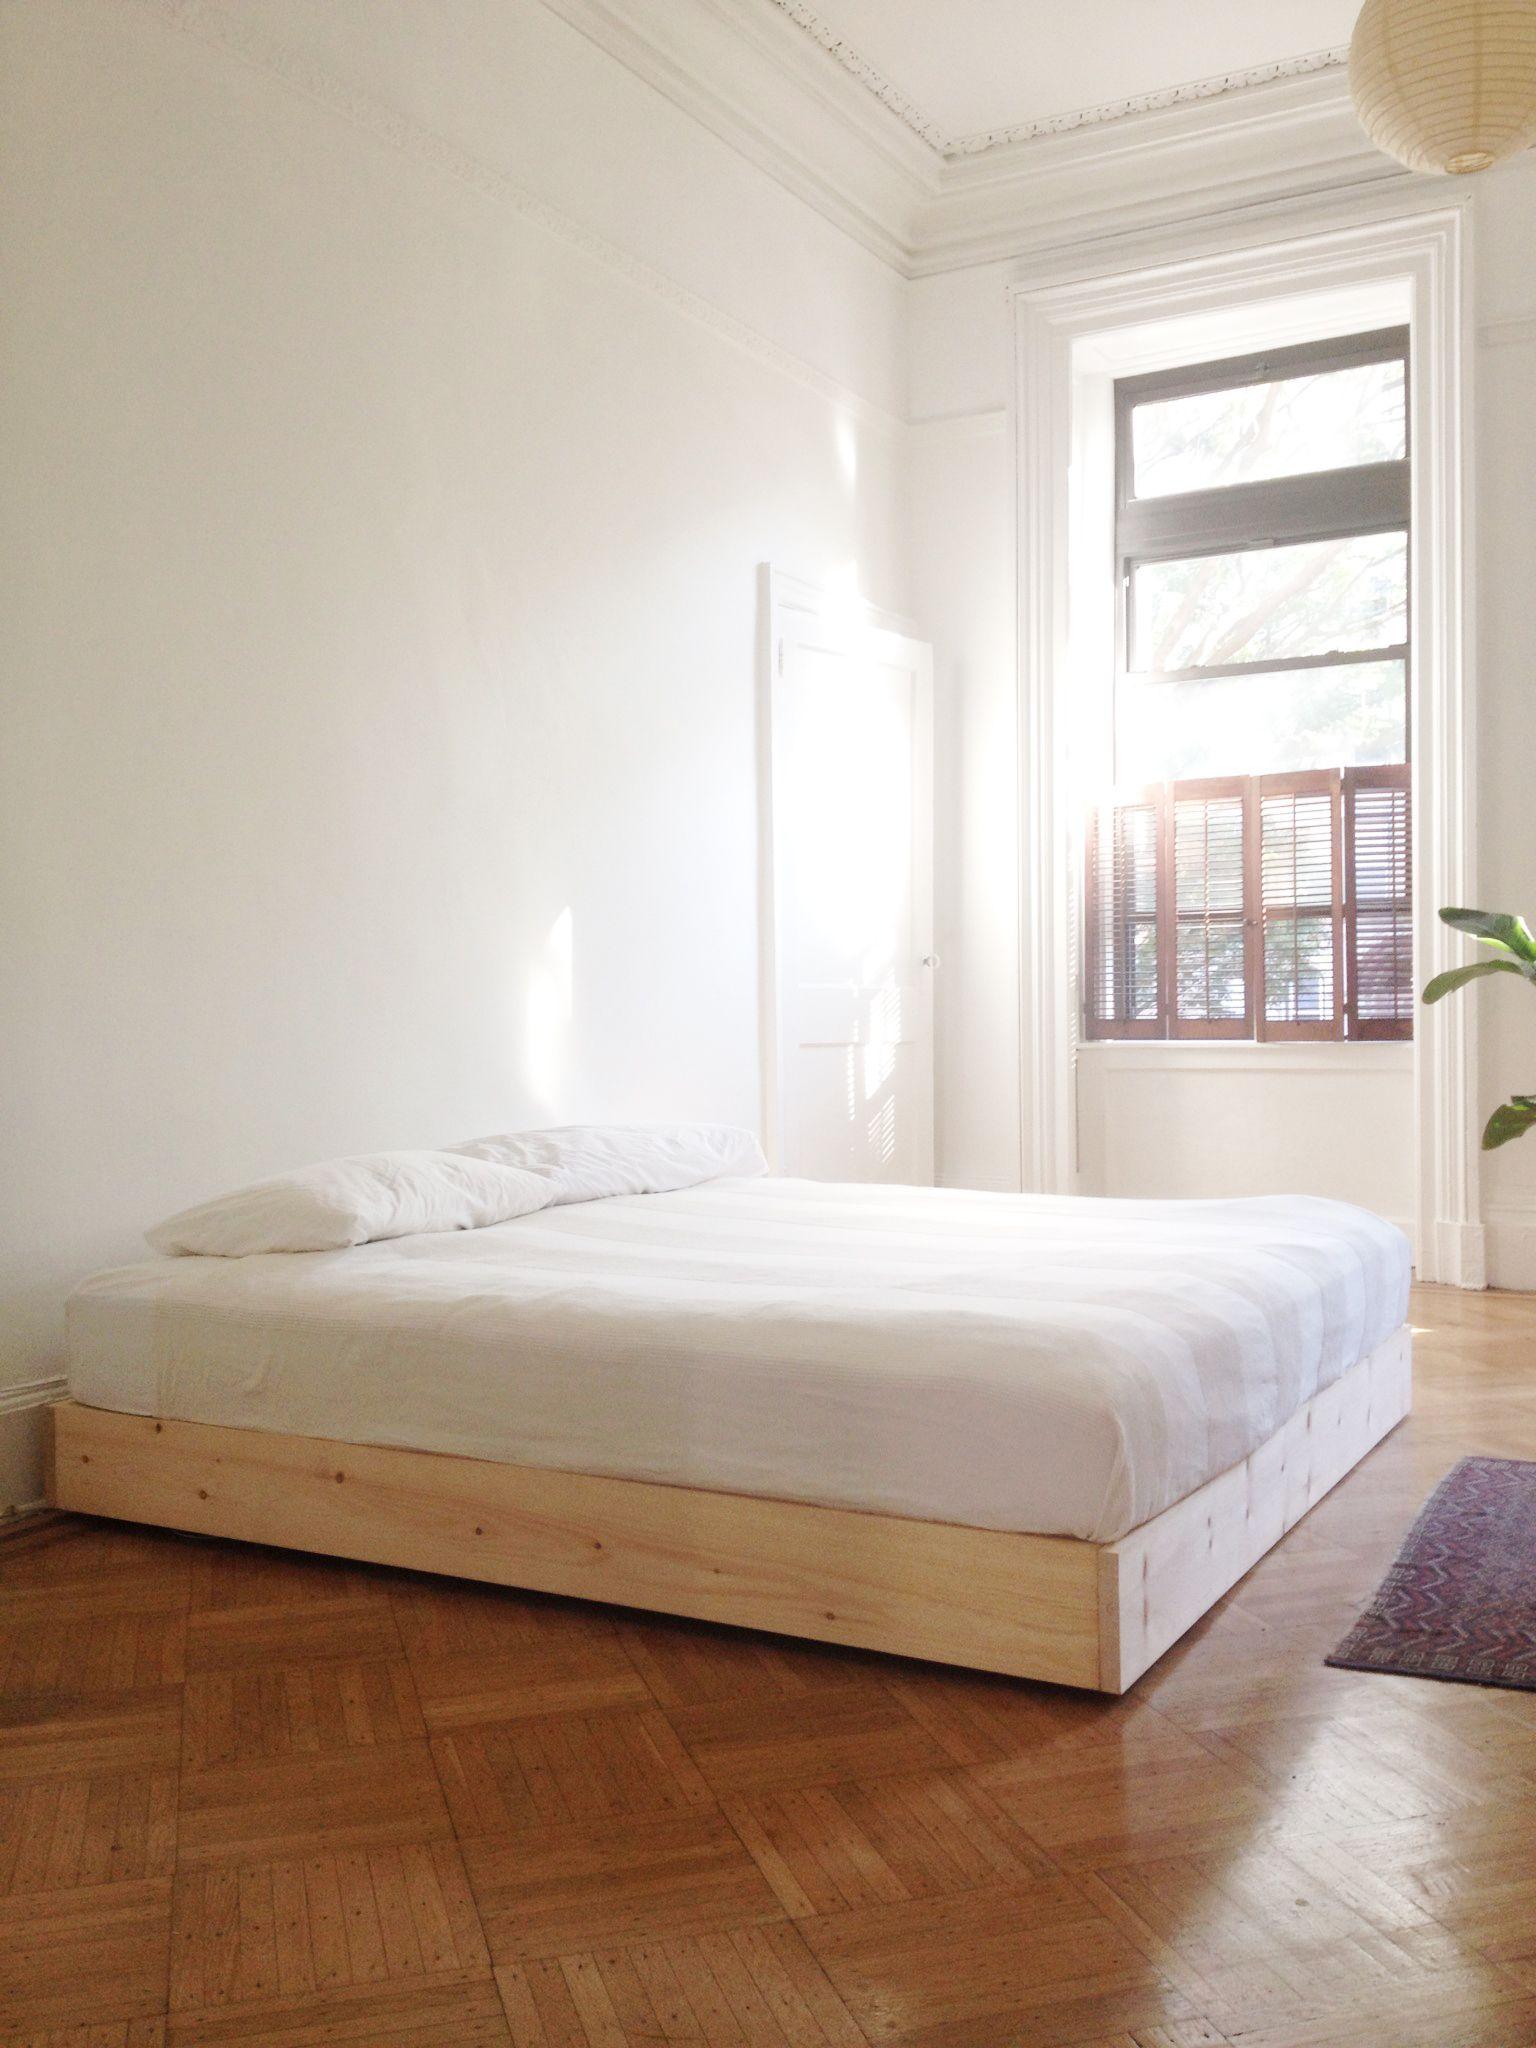 Best 25 Scandinavian Bunk Beds Ideas On Pinterest: The 25+ Best Simple Wood Bed Frame Ideas On Pinterest